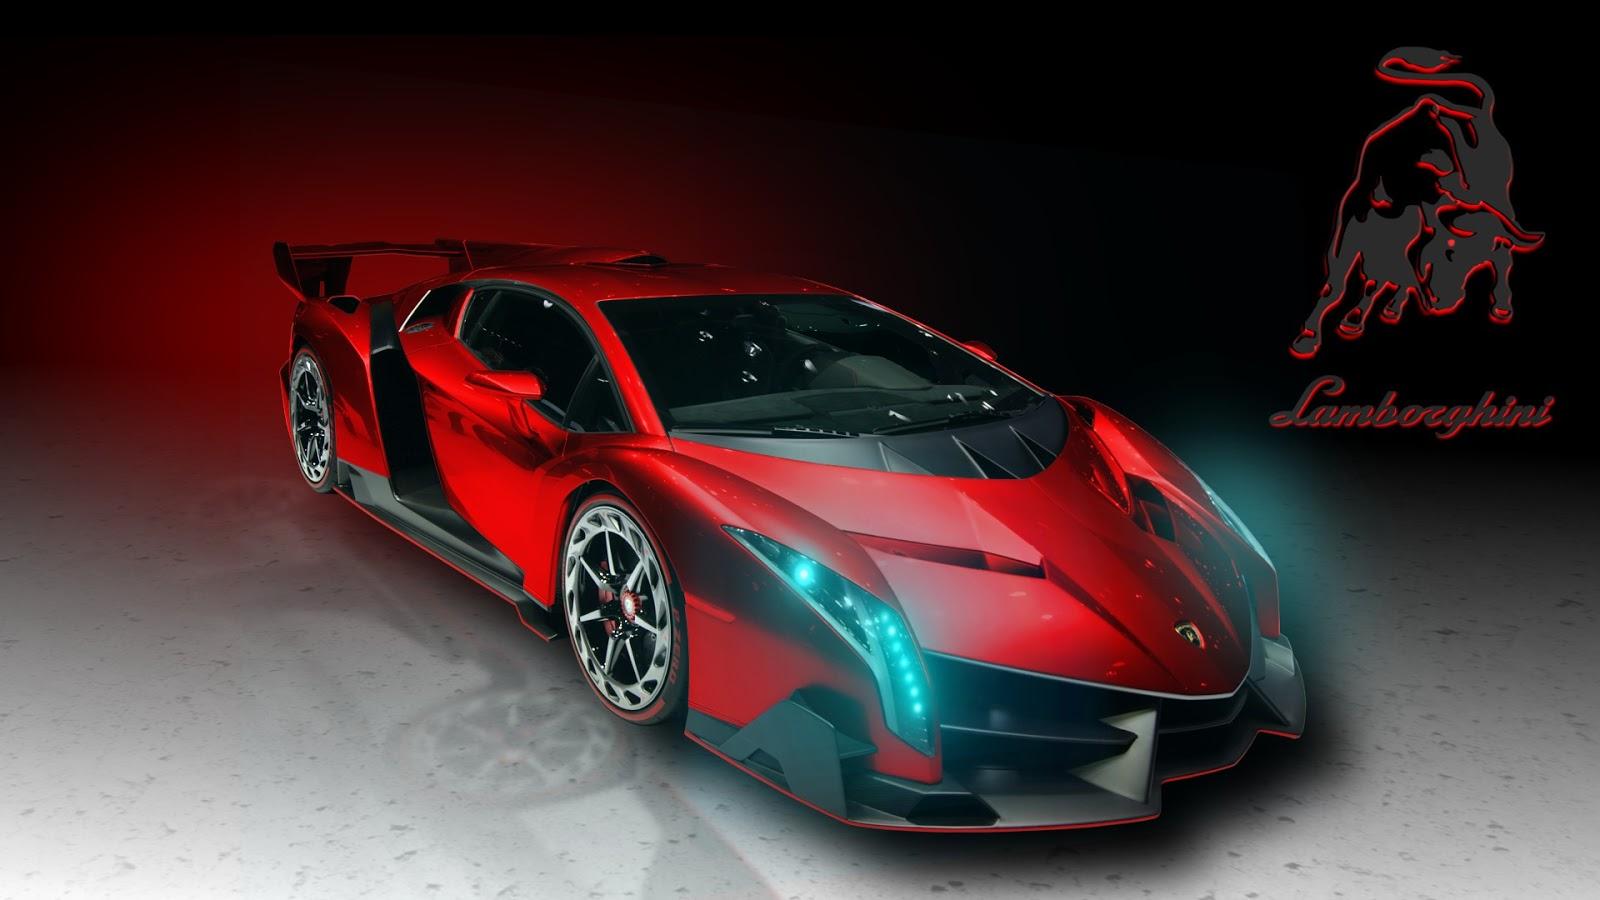 Cars Picture Image Photo Hd Background Desktop Pc Download Lamborghini Veneno 2015 HD Wallpaper For Your